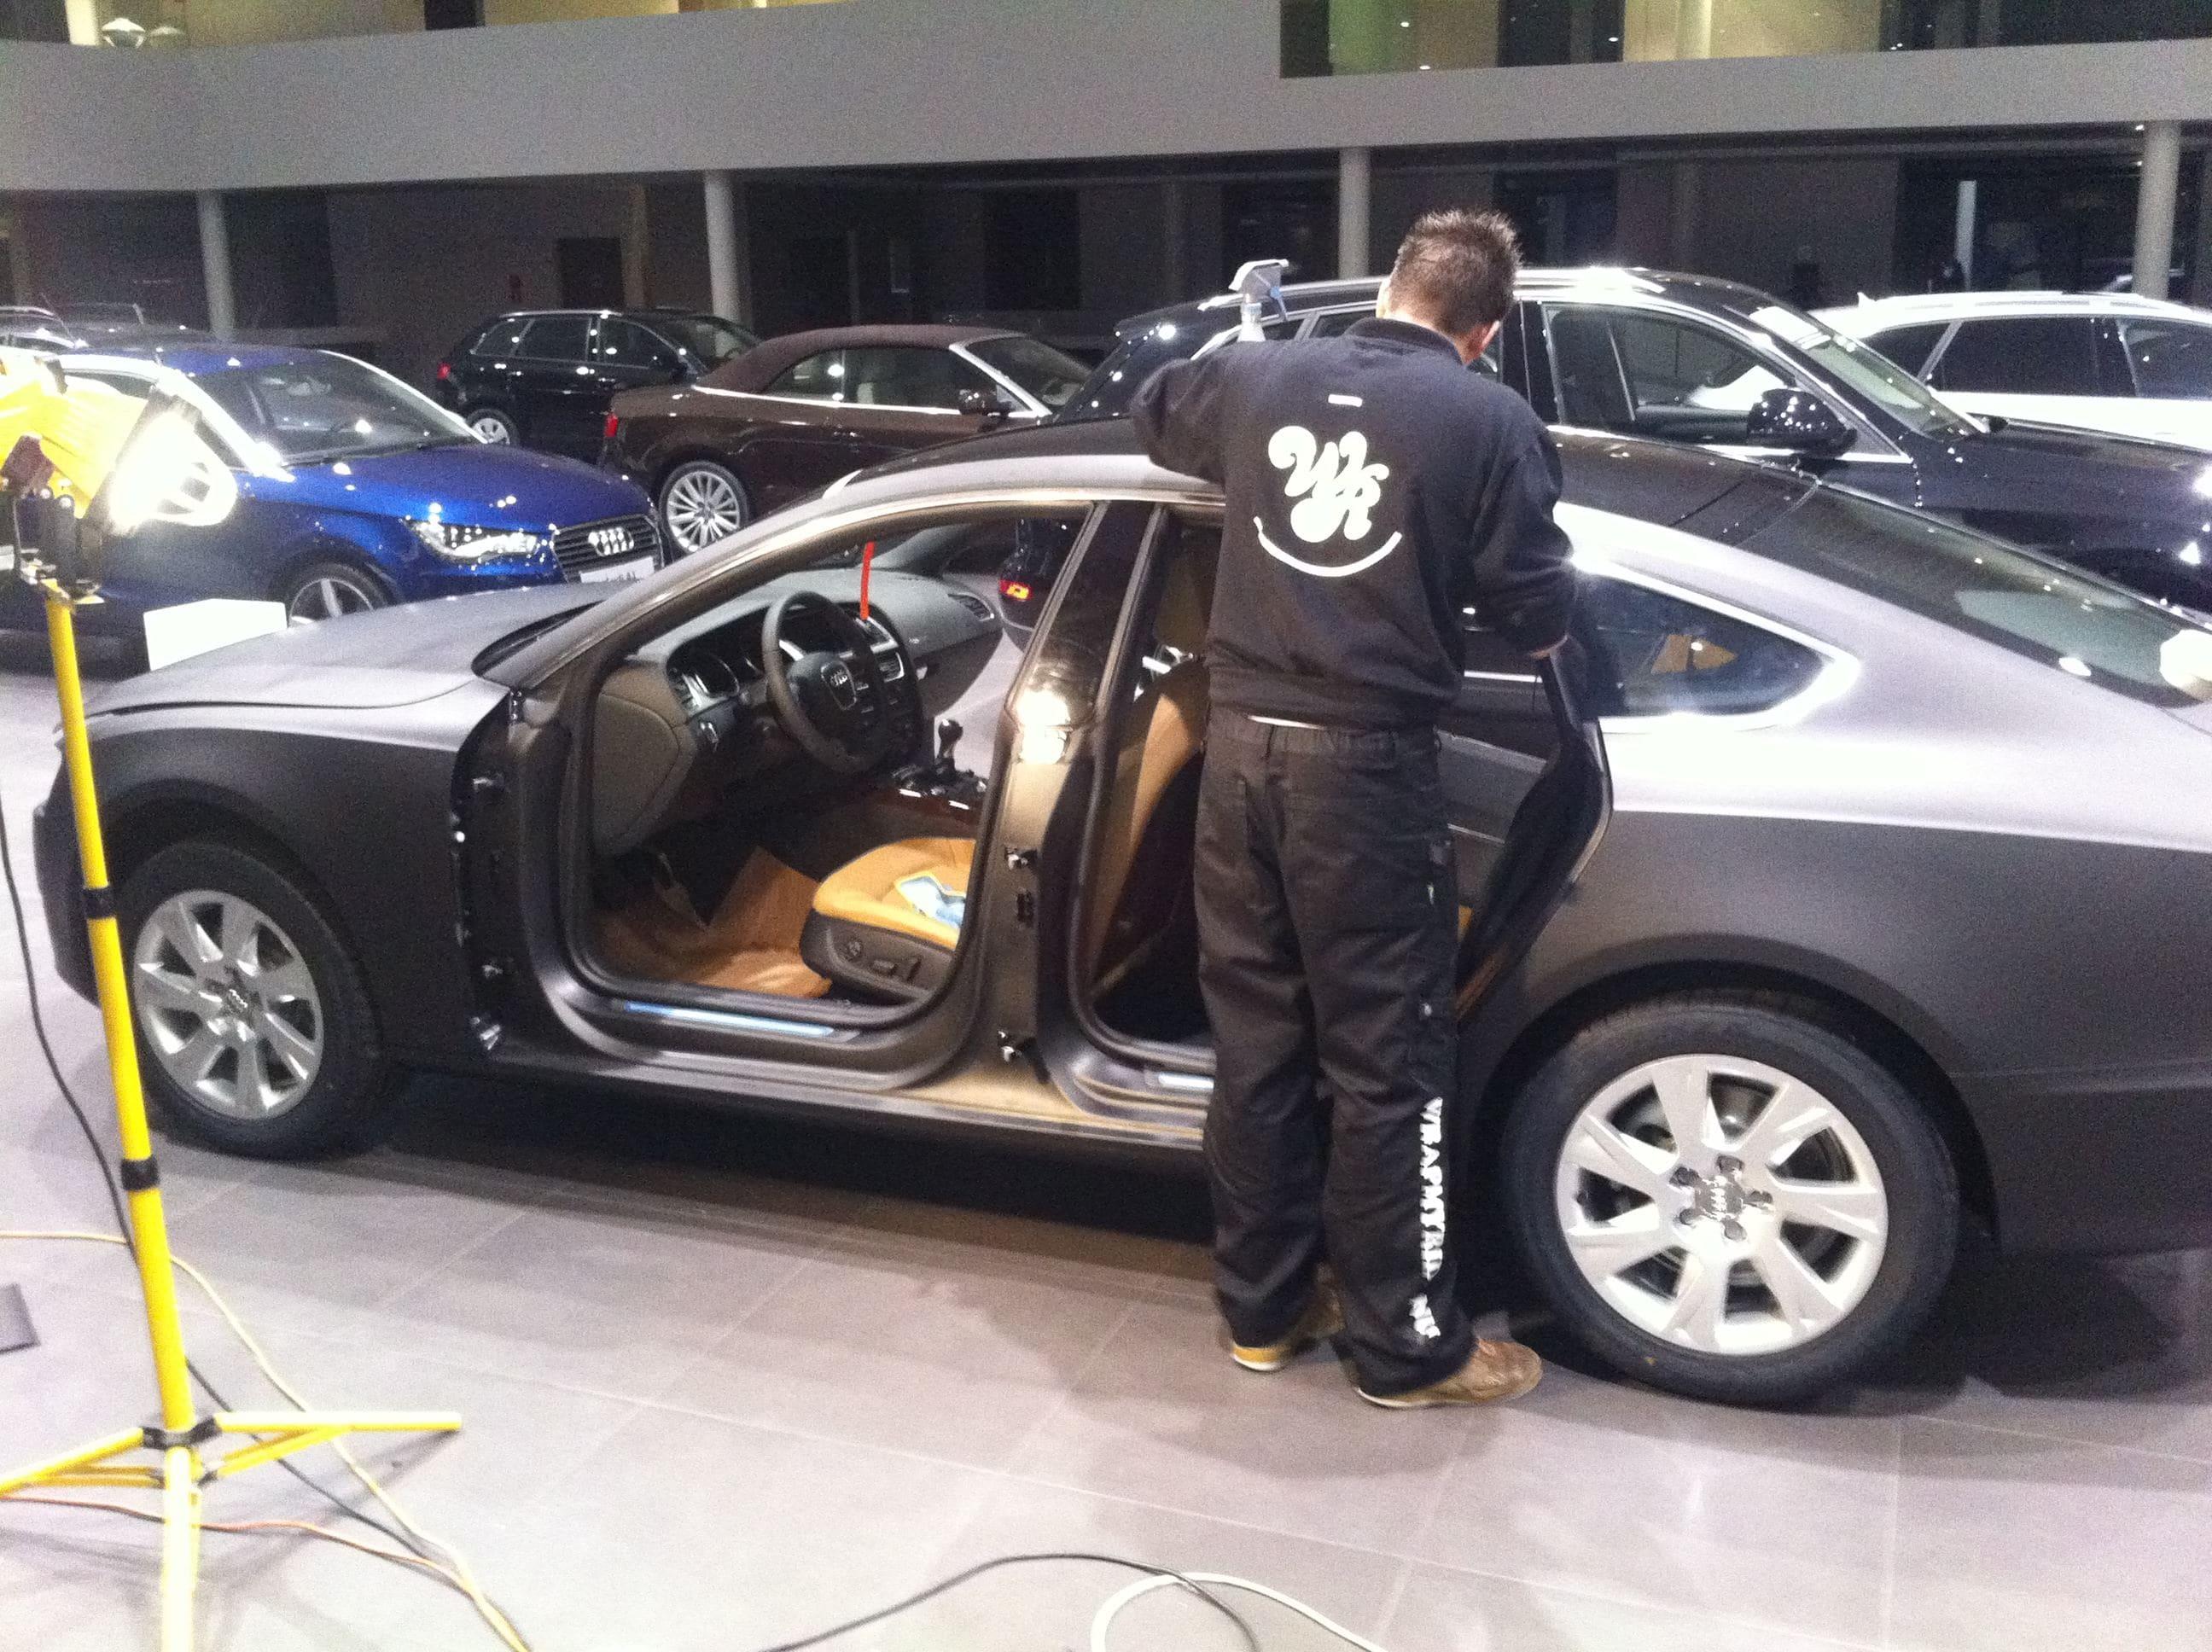 Audi A5 Sportback met Mat Grijze Wrap, Carwrapping door Wrapmyride.nu Foto-nr:4782, ©2021